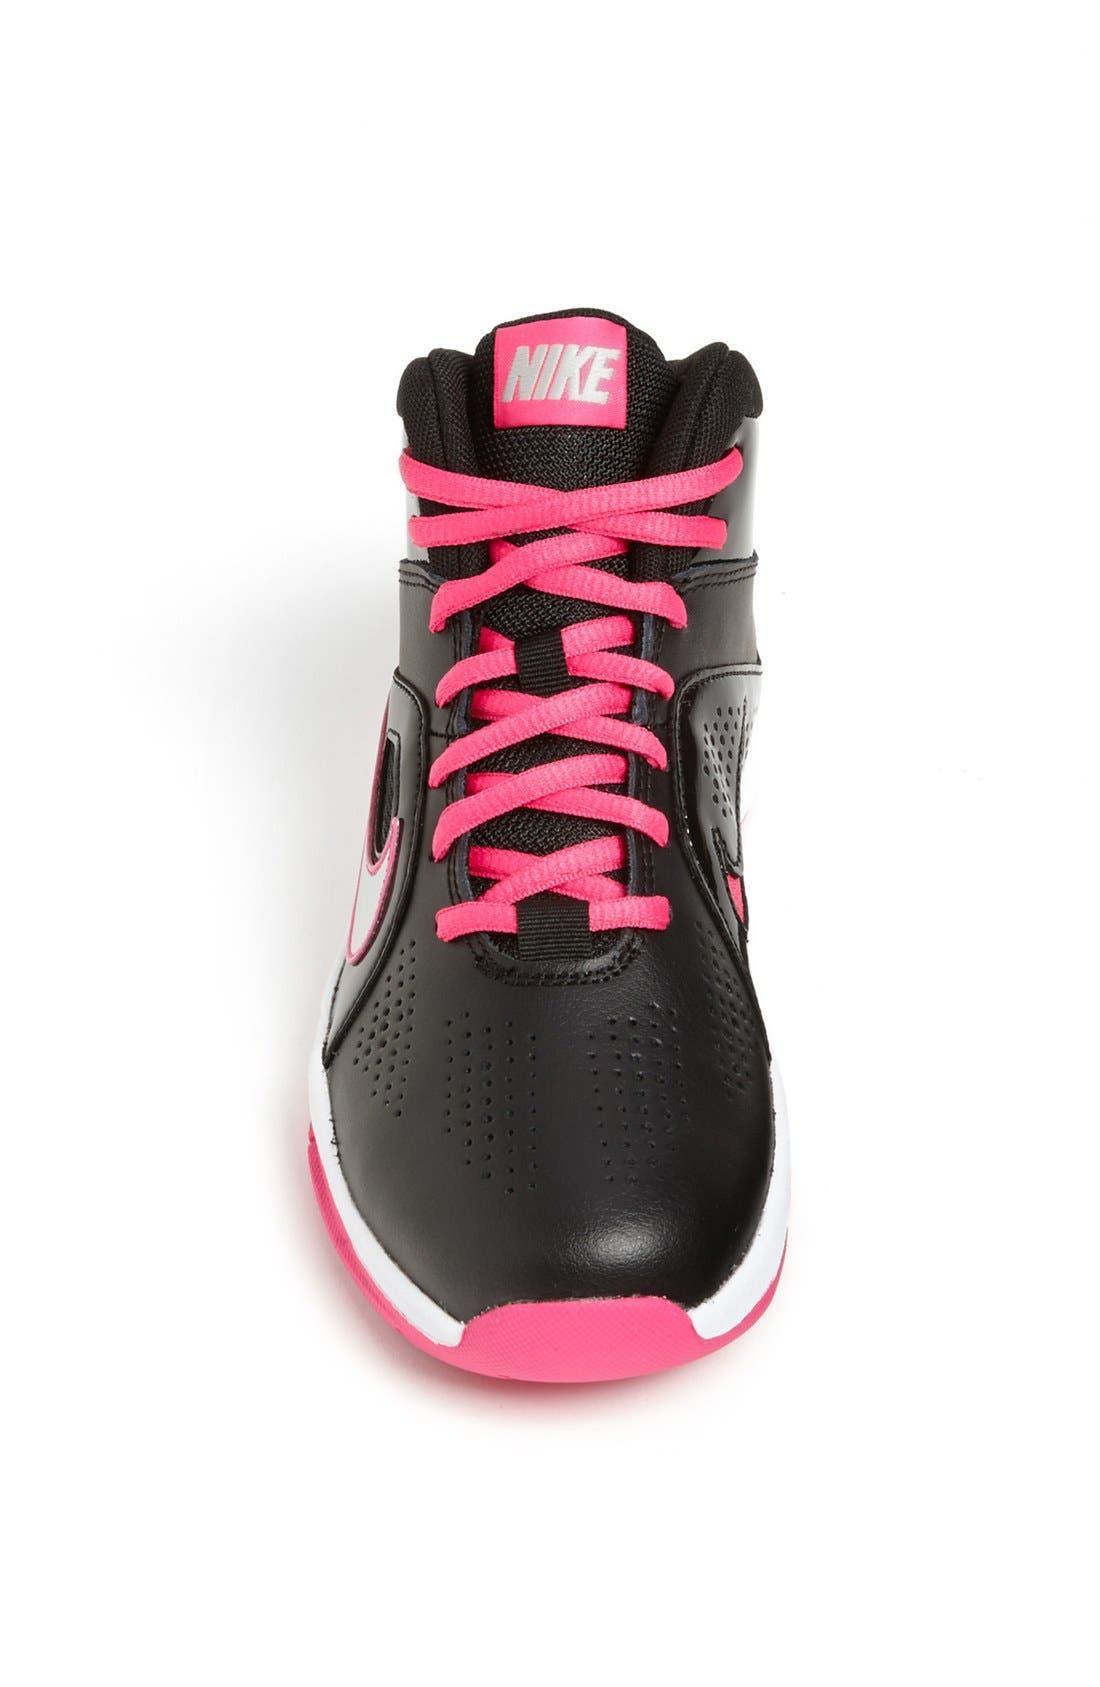 Alternate Image 3  - Nike 'Team Hustle' Basketball Shoe (Toddler, Little Kid & Big Kid)